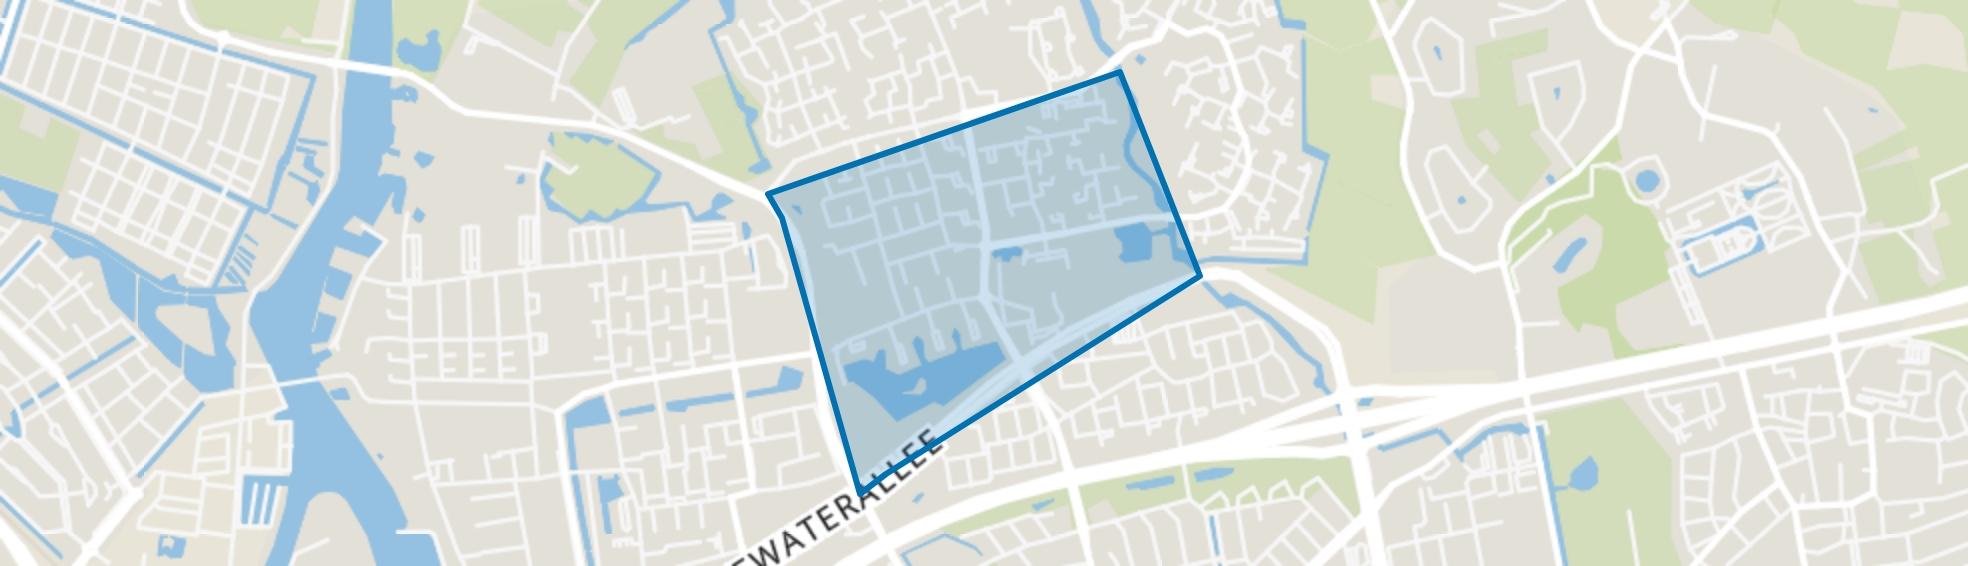 Aa-landen-Midden, Zwolle map